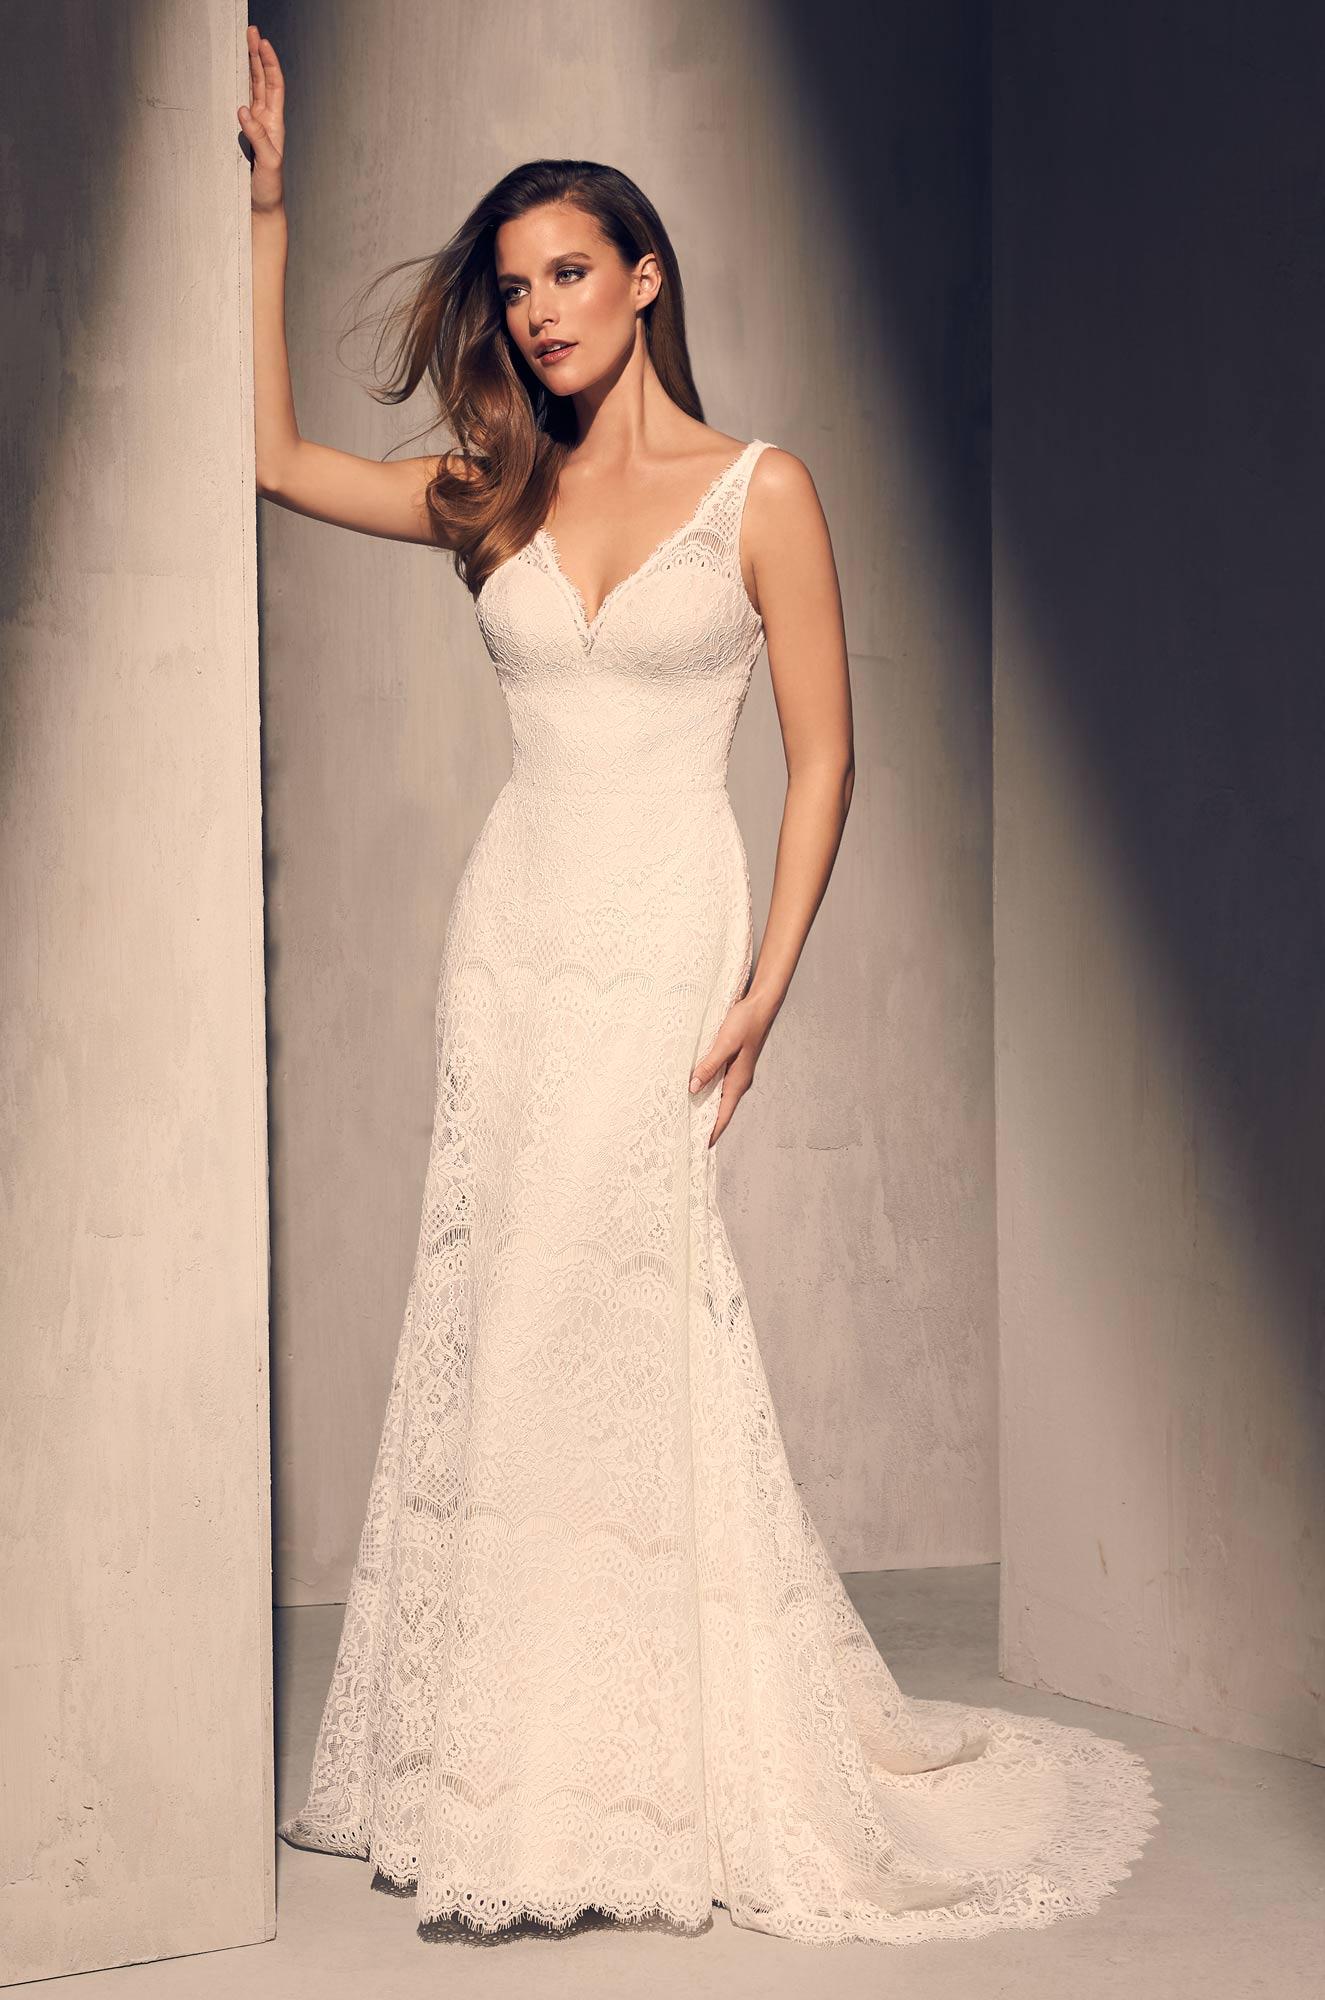 Timeless Lace Wedding Dress - Style #2217   Mikaella Bridal